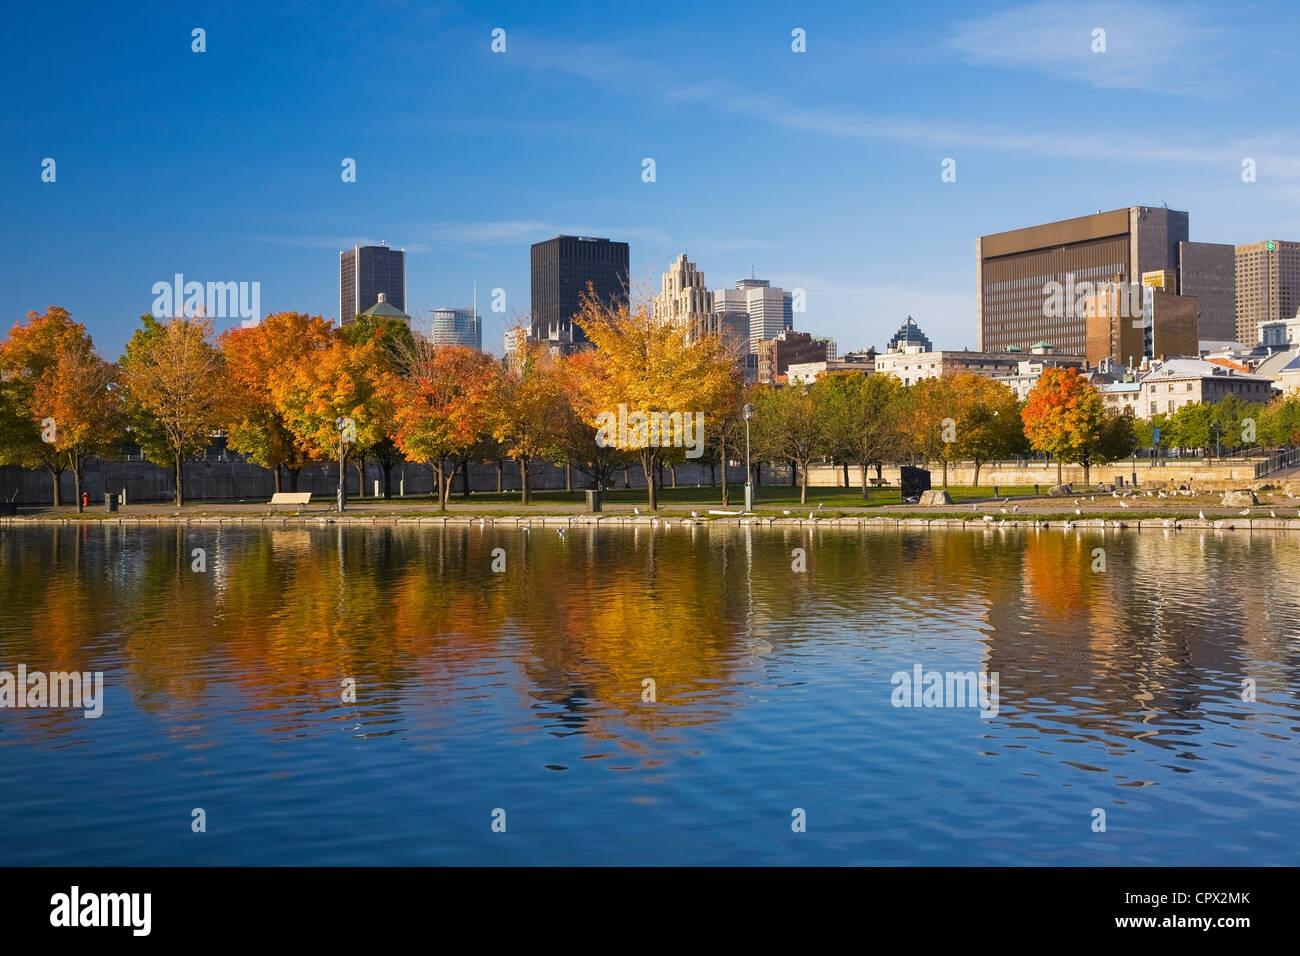 Skyline, Montreal, Quebec, Canada Immagini Stock